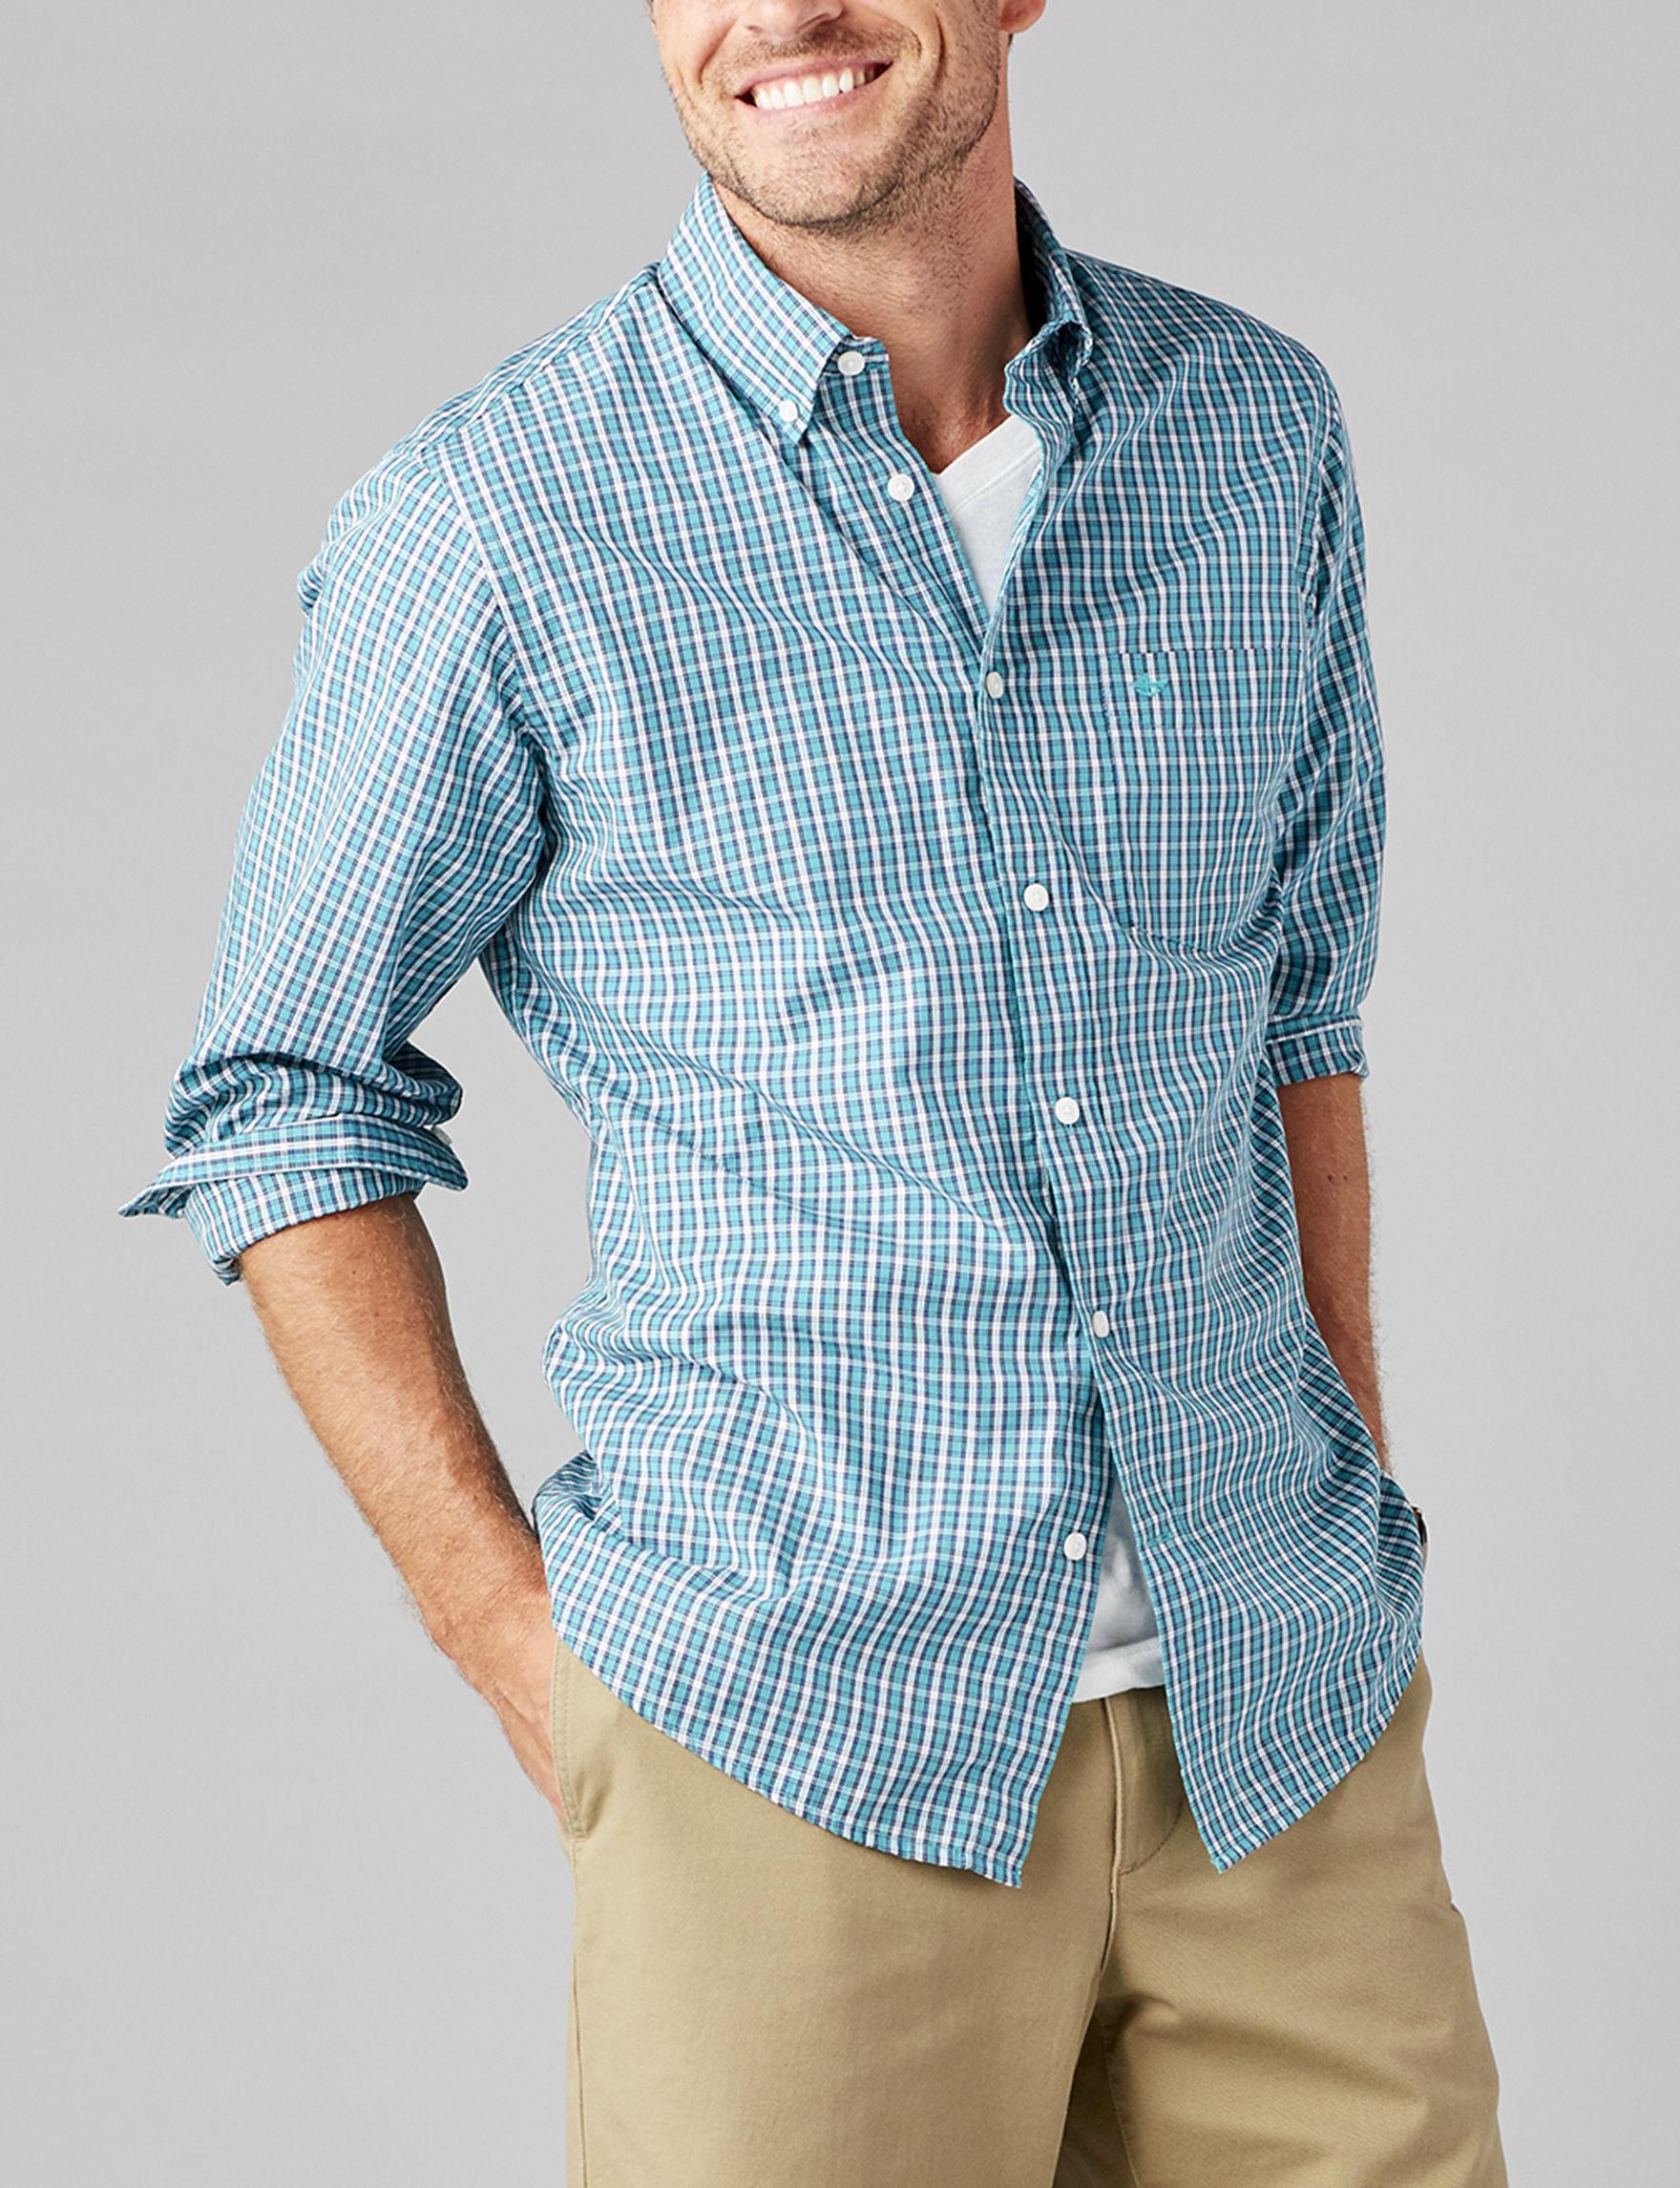 Dockers La Palma Turquoise Casual Button Down Shirts